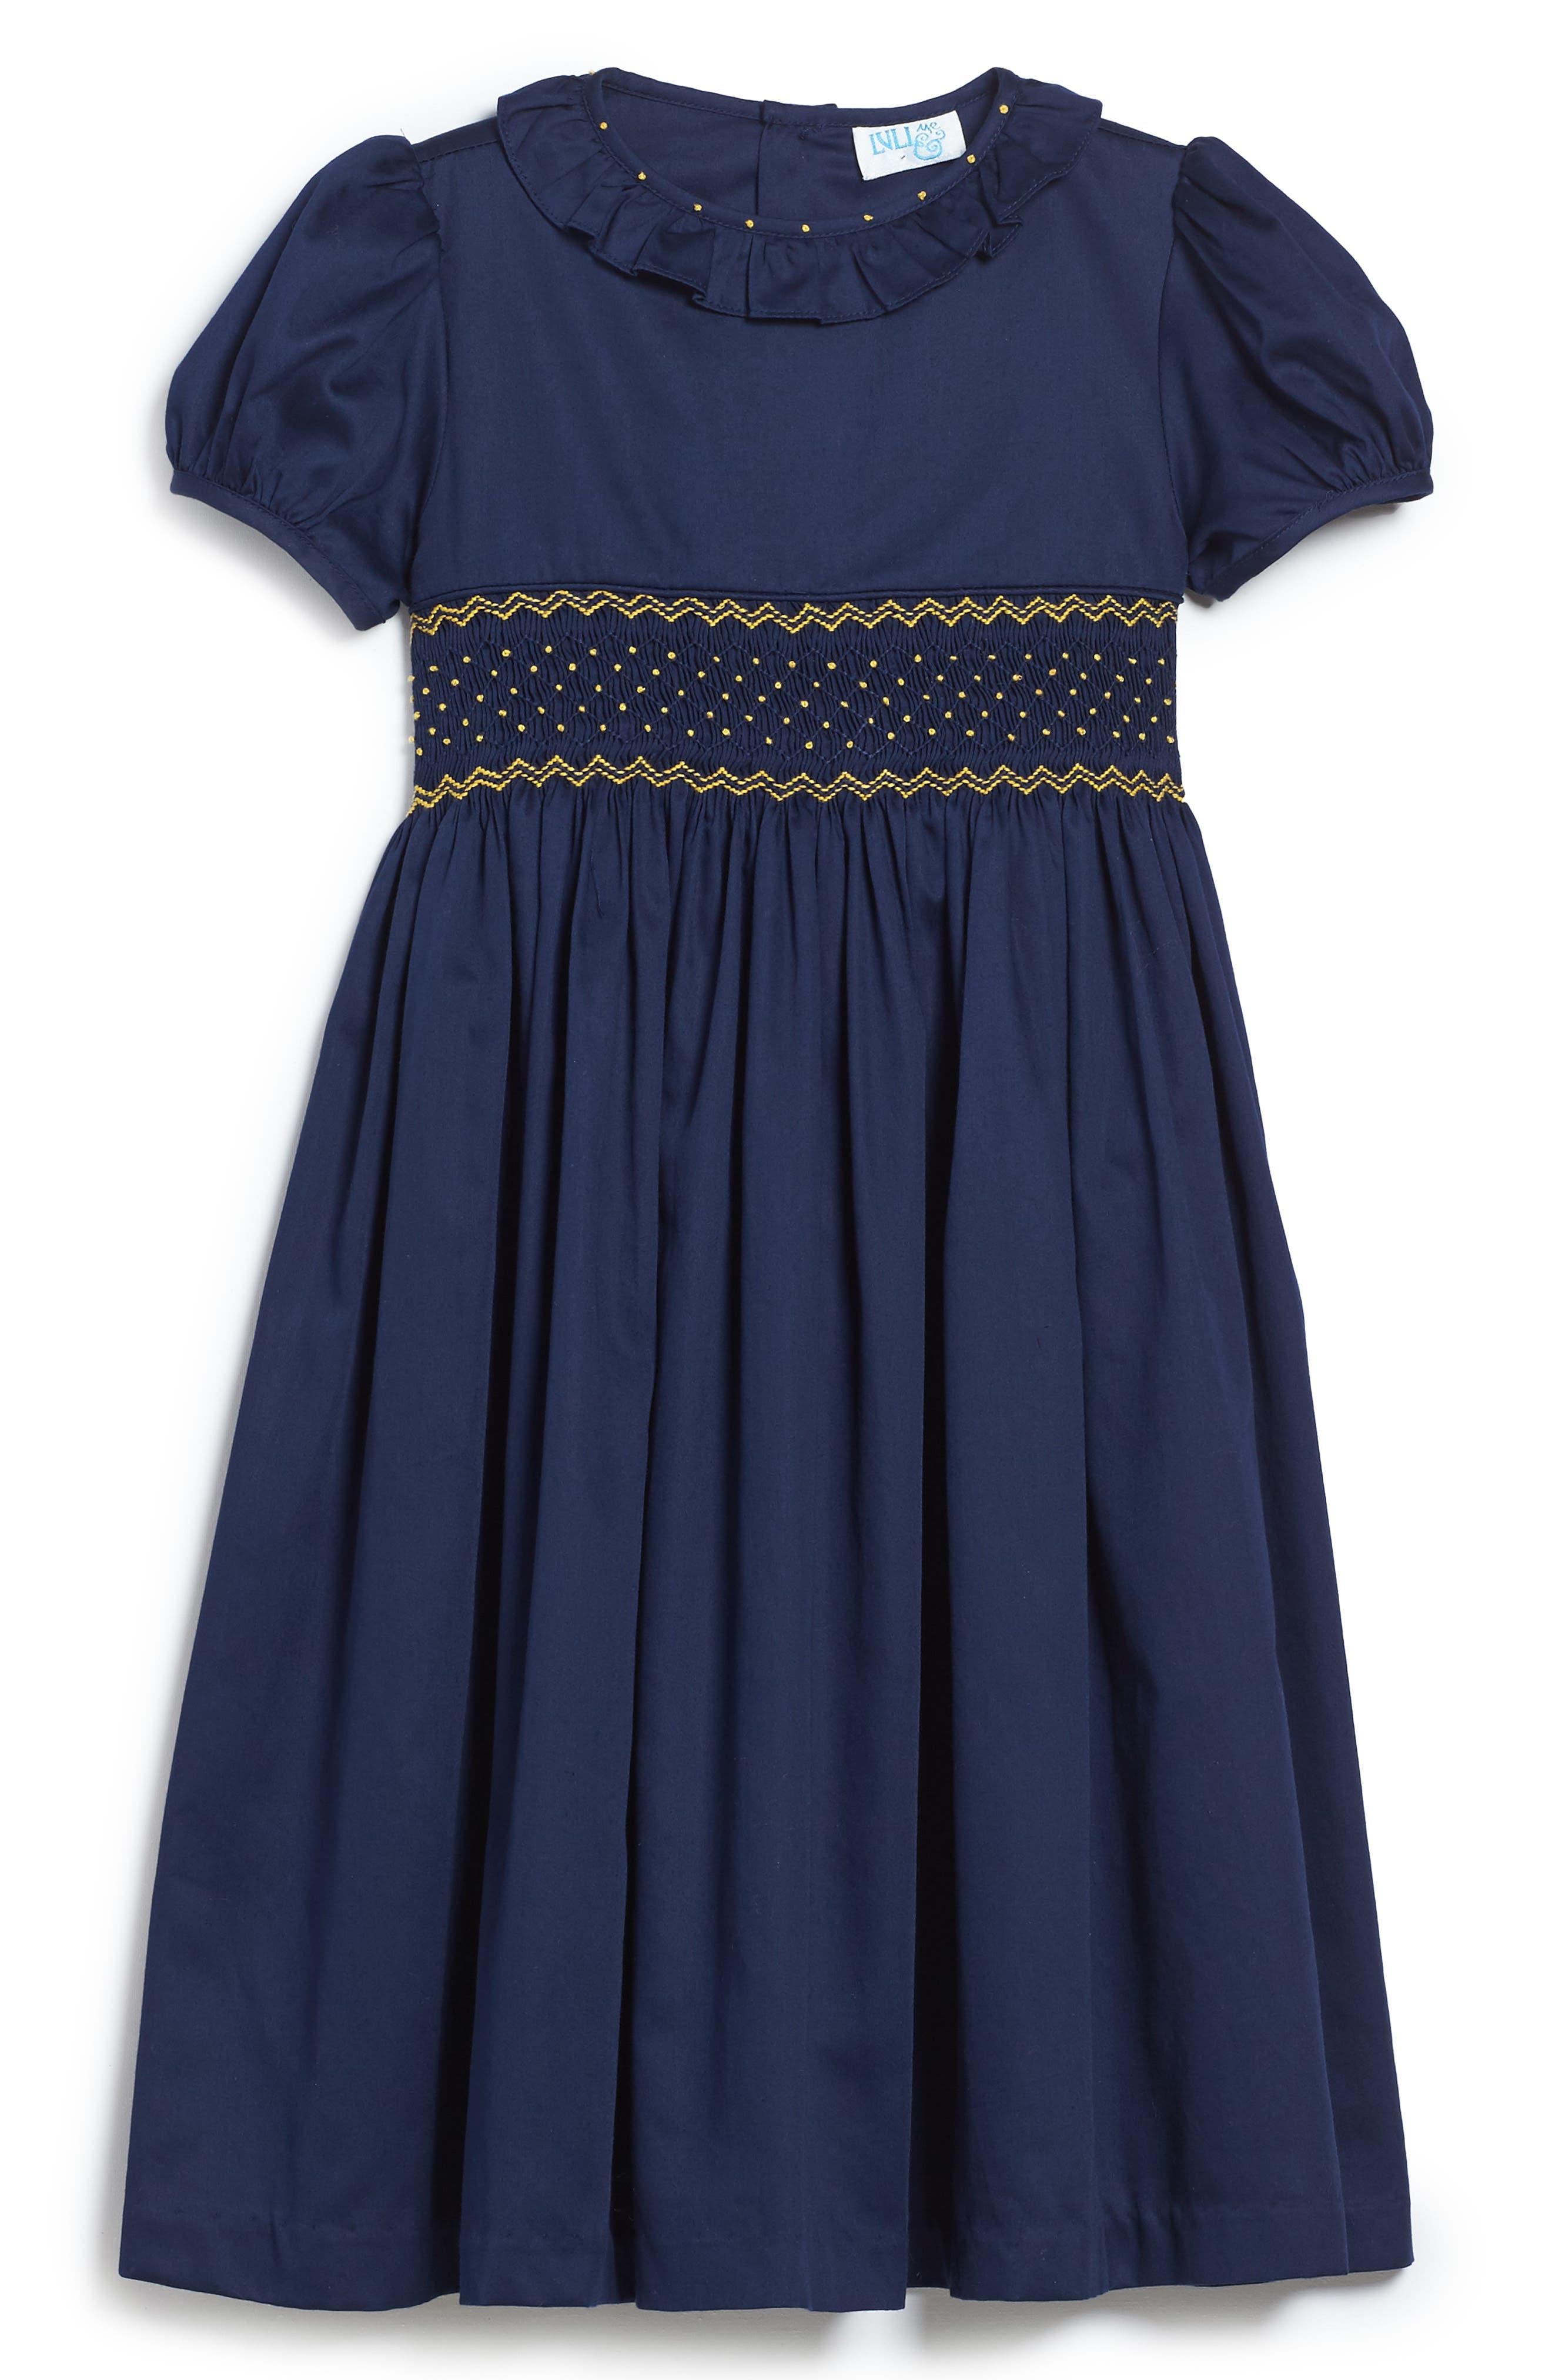 Main Image - Luli & Me Smocked Dress (Toddler Girls & Little Girls)